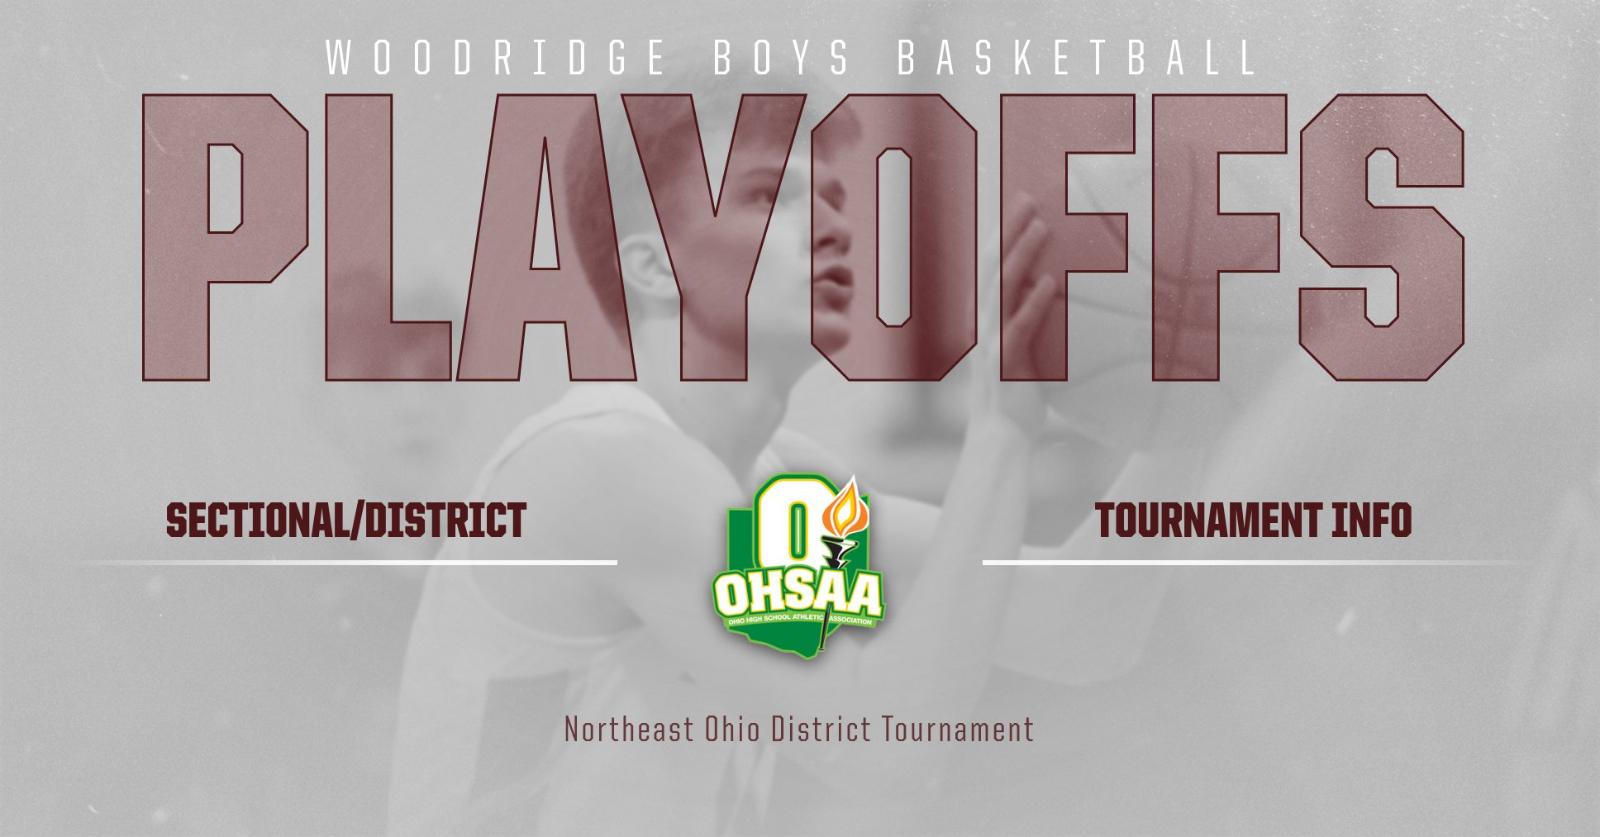 Boys Basketball OHSAA Tournament Info